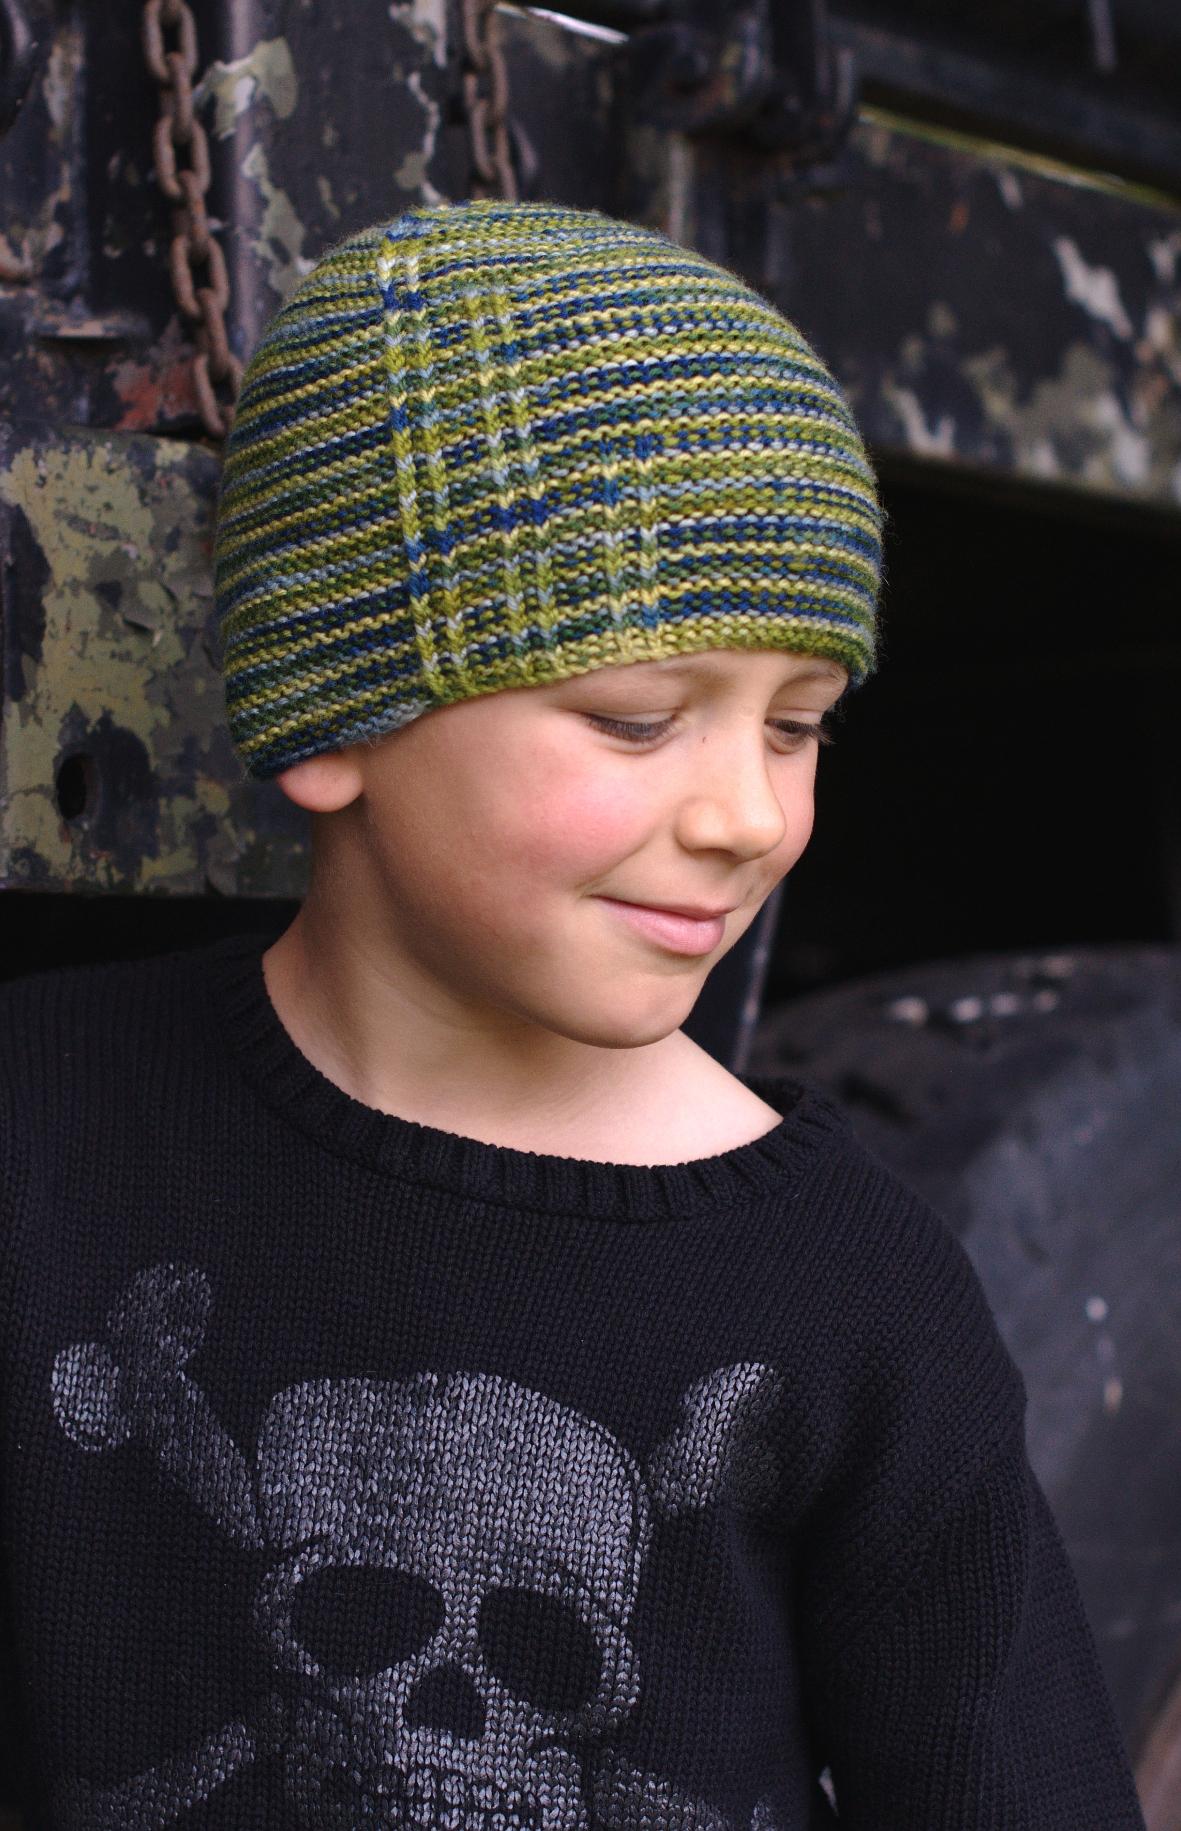 Gorton beanie hand knitting pattern